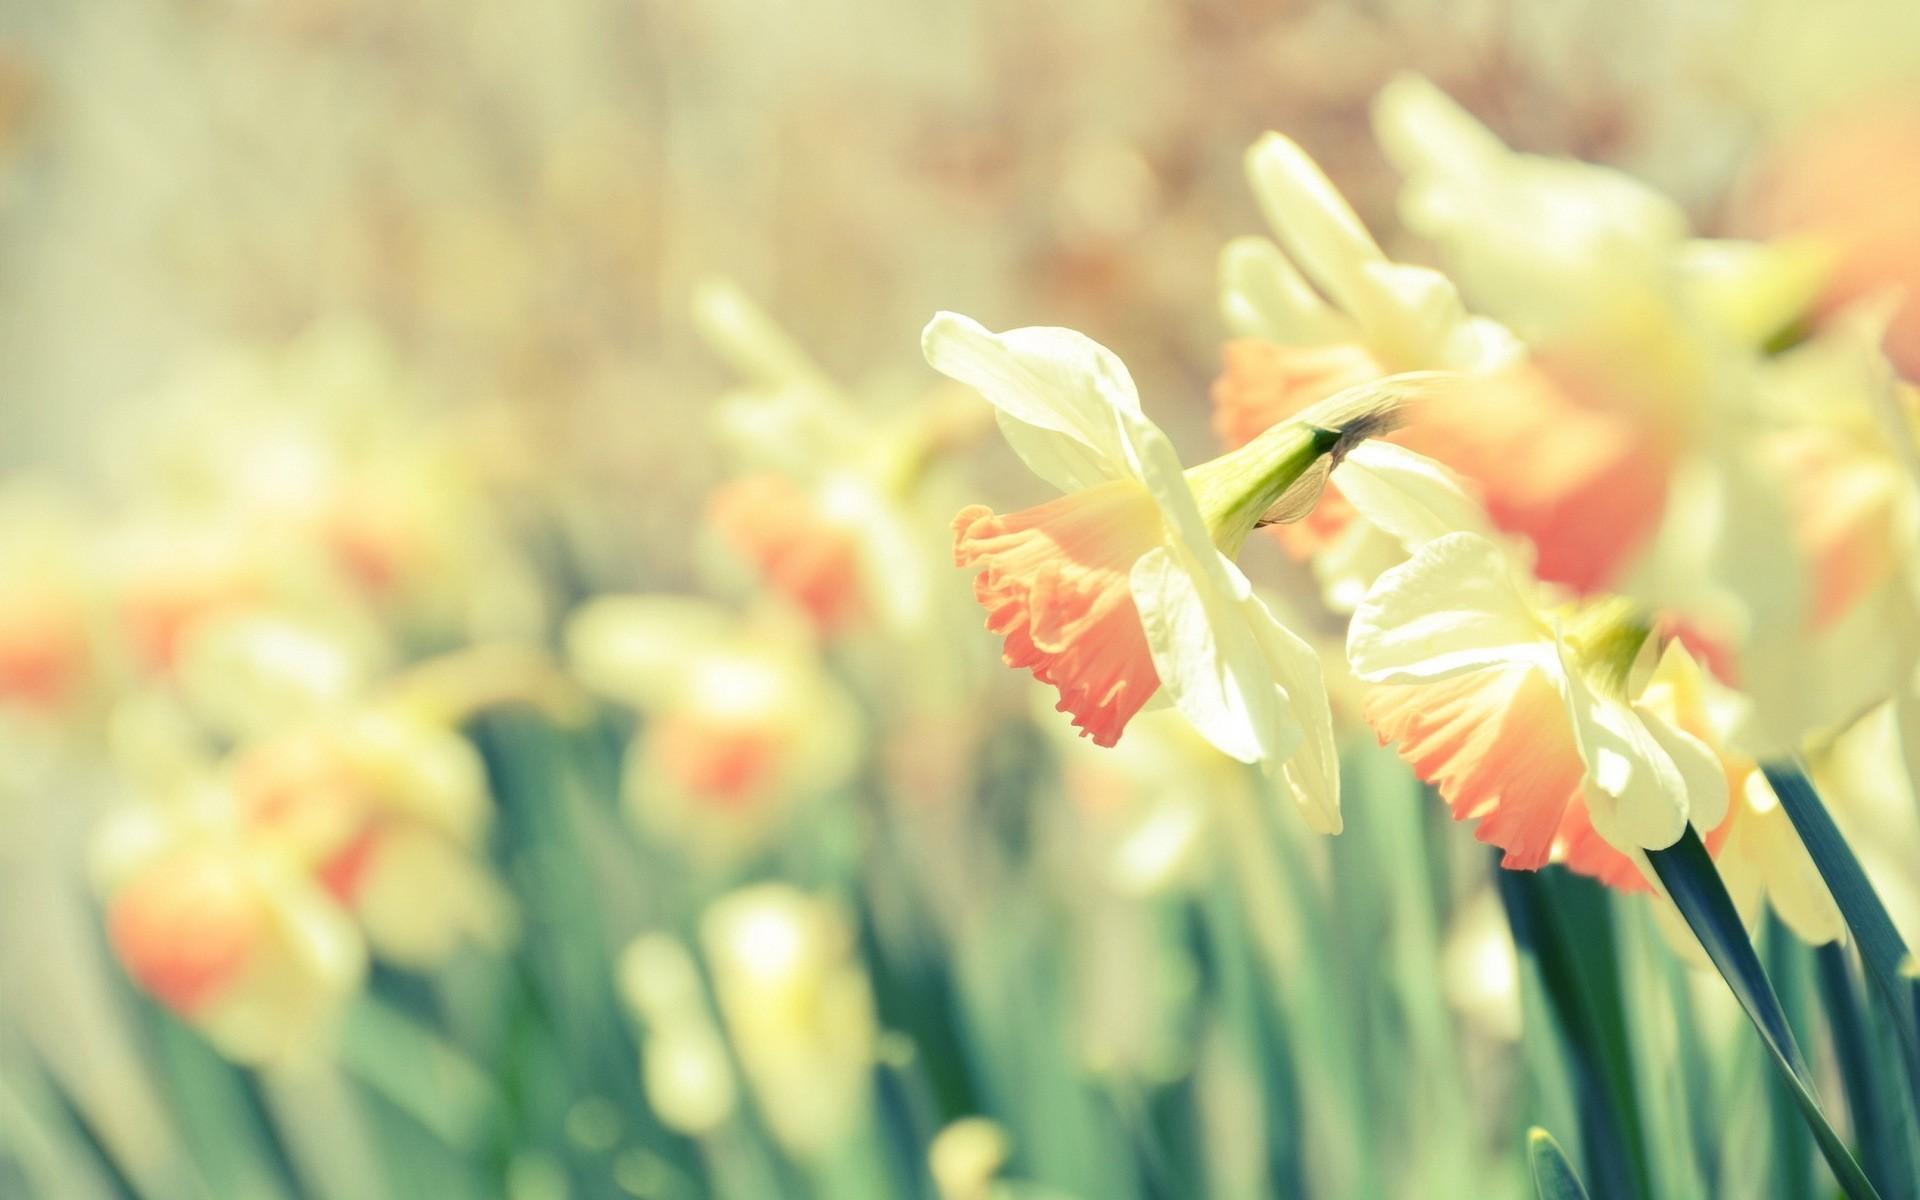 1920x1200 romantic screensaver cute daffodils hd desktop wallpaper hd desktop